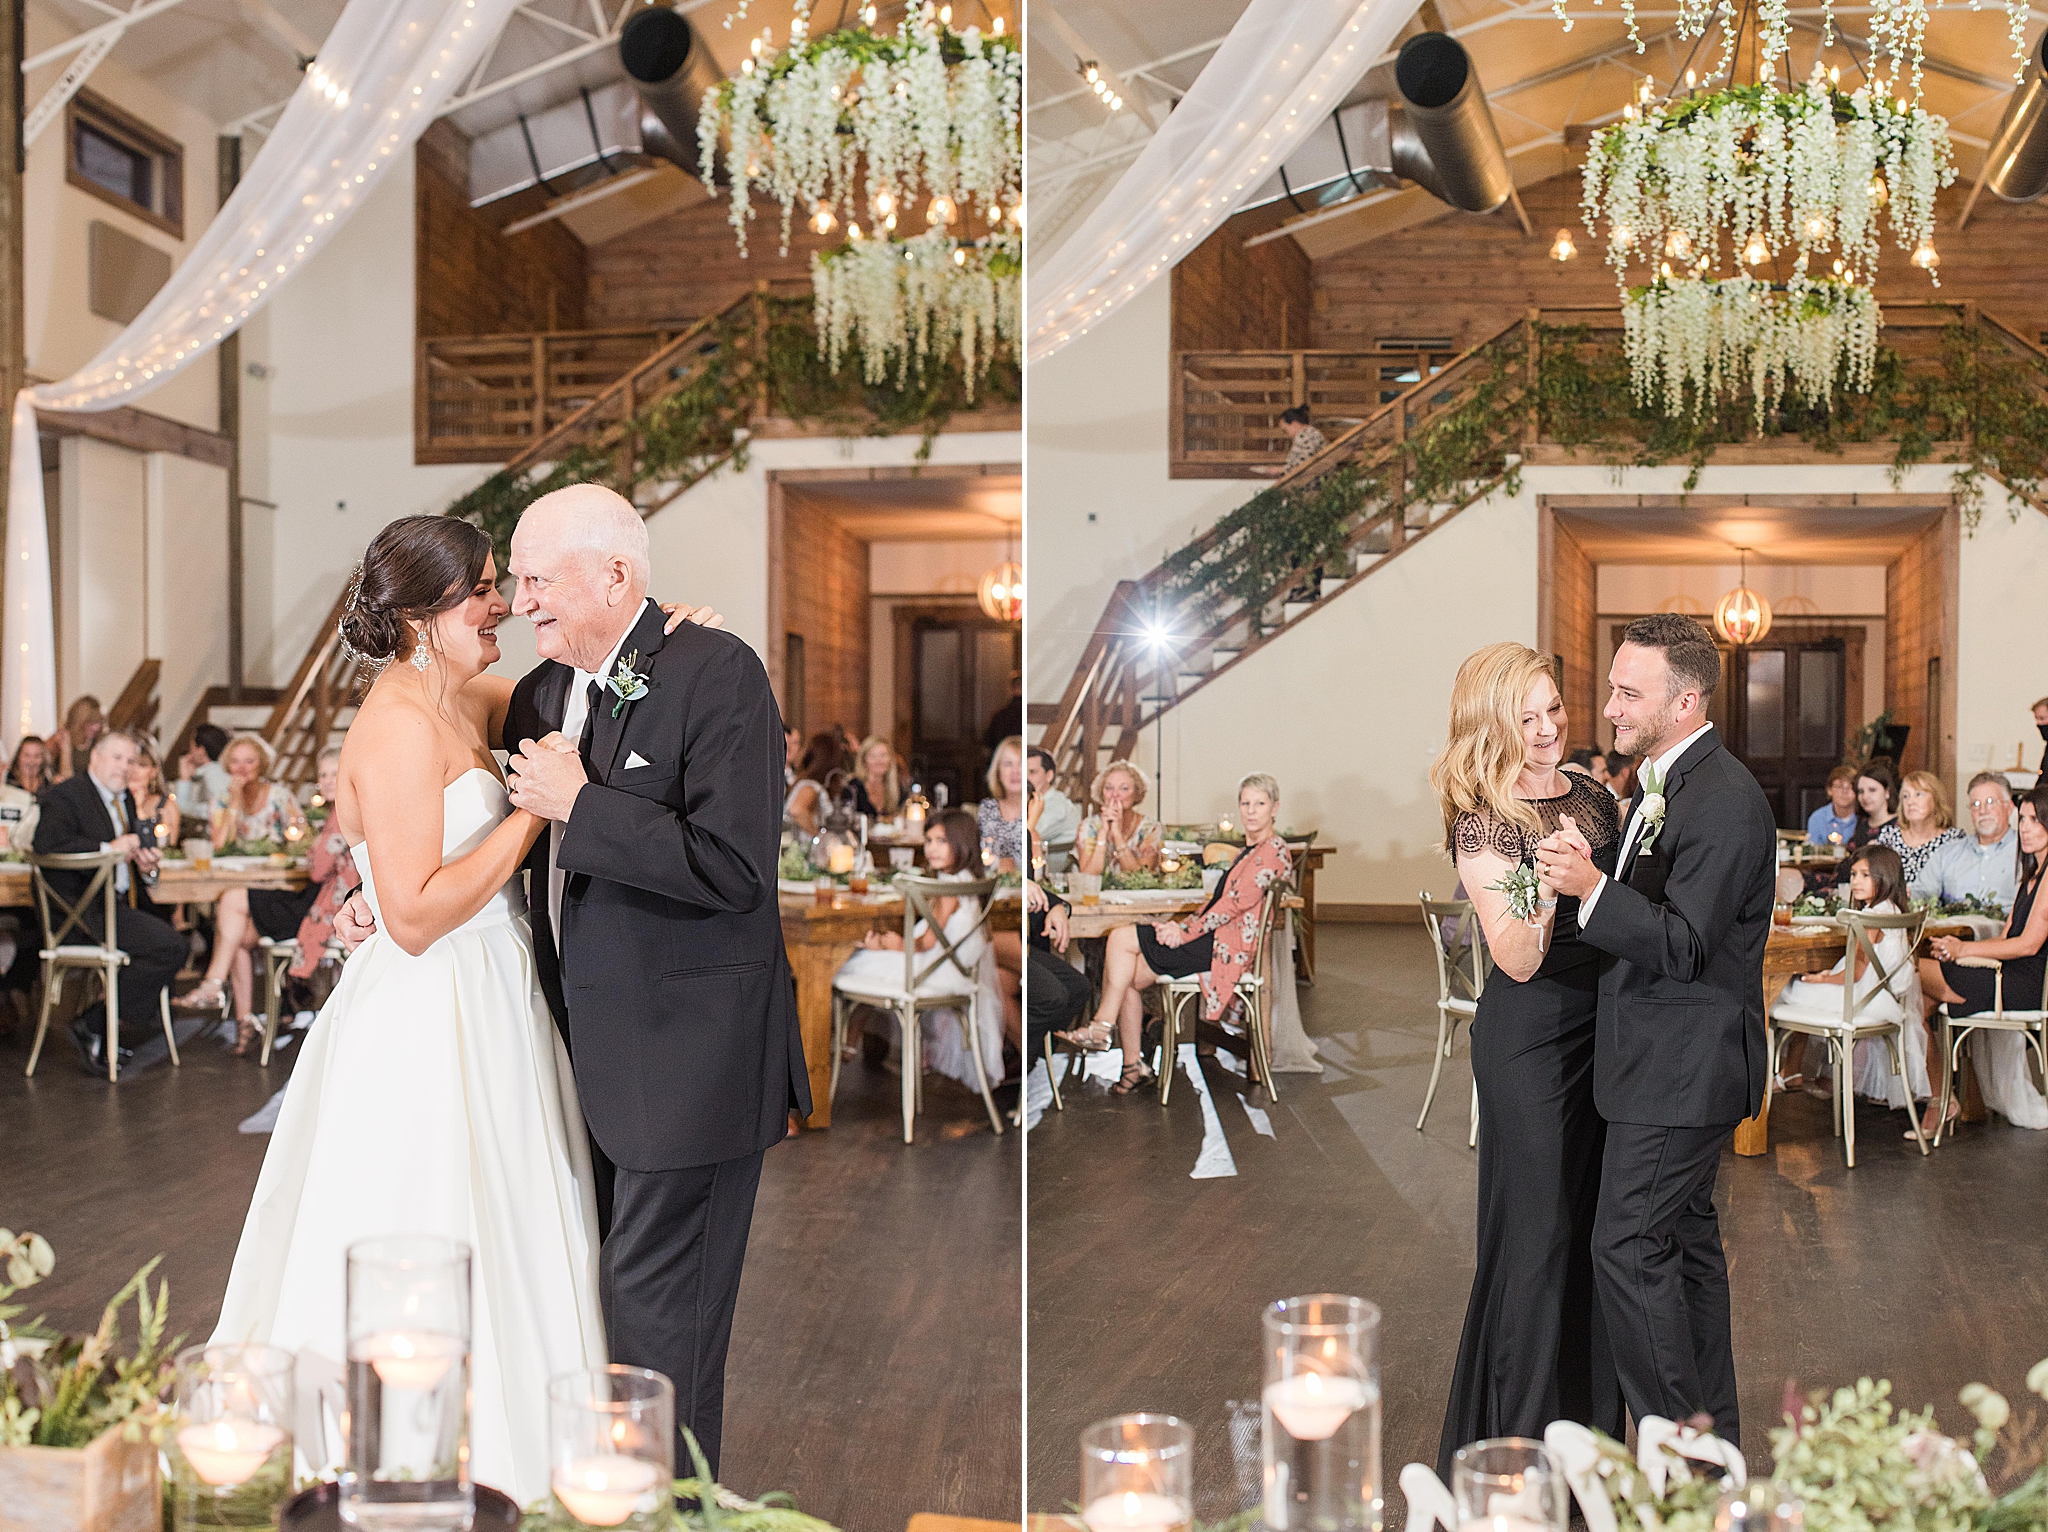 newlyweds dance with parents at Alabama wedding reception